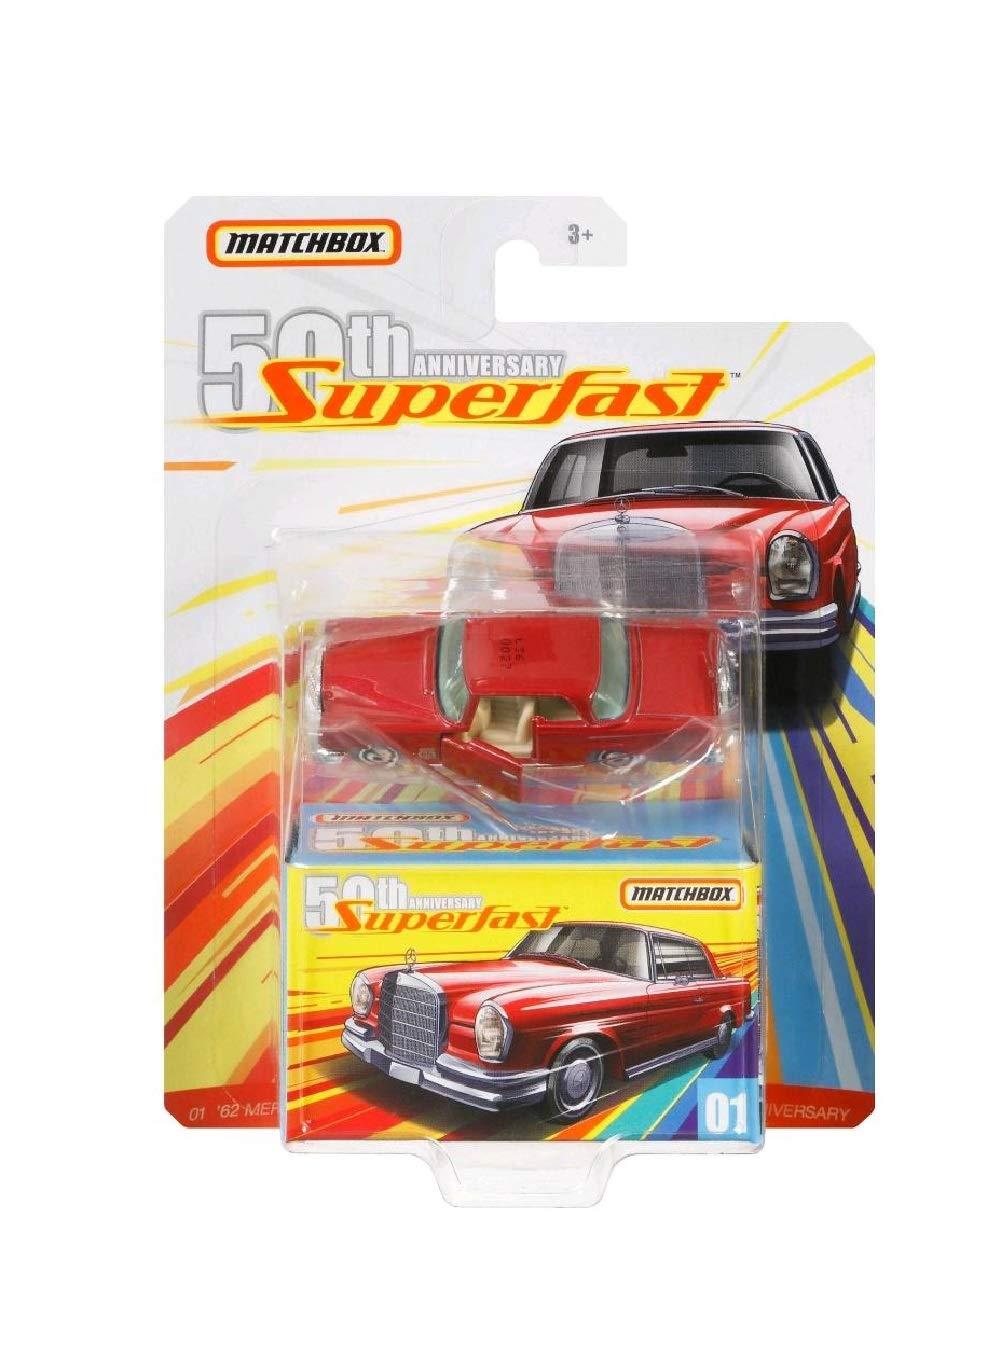 Matchbox 62 Mercedes Benz 50th Anniversary Superfast 01